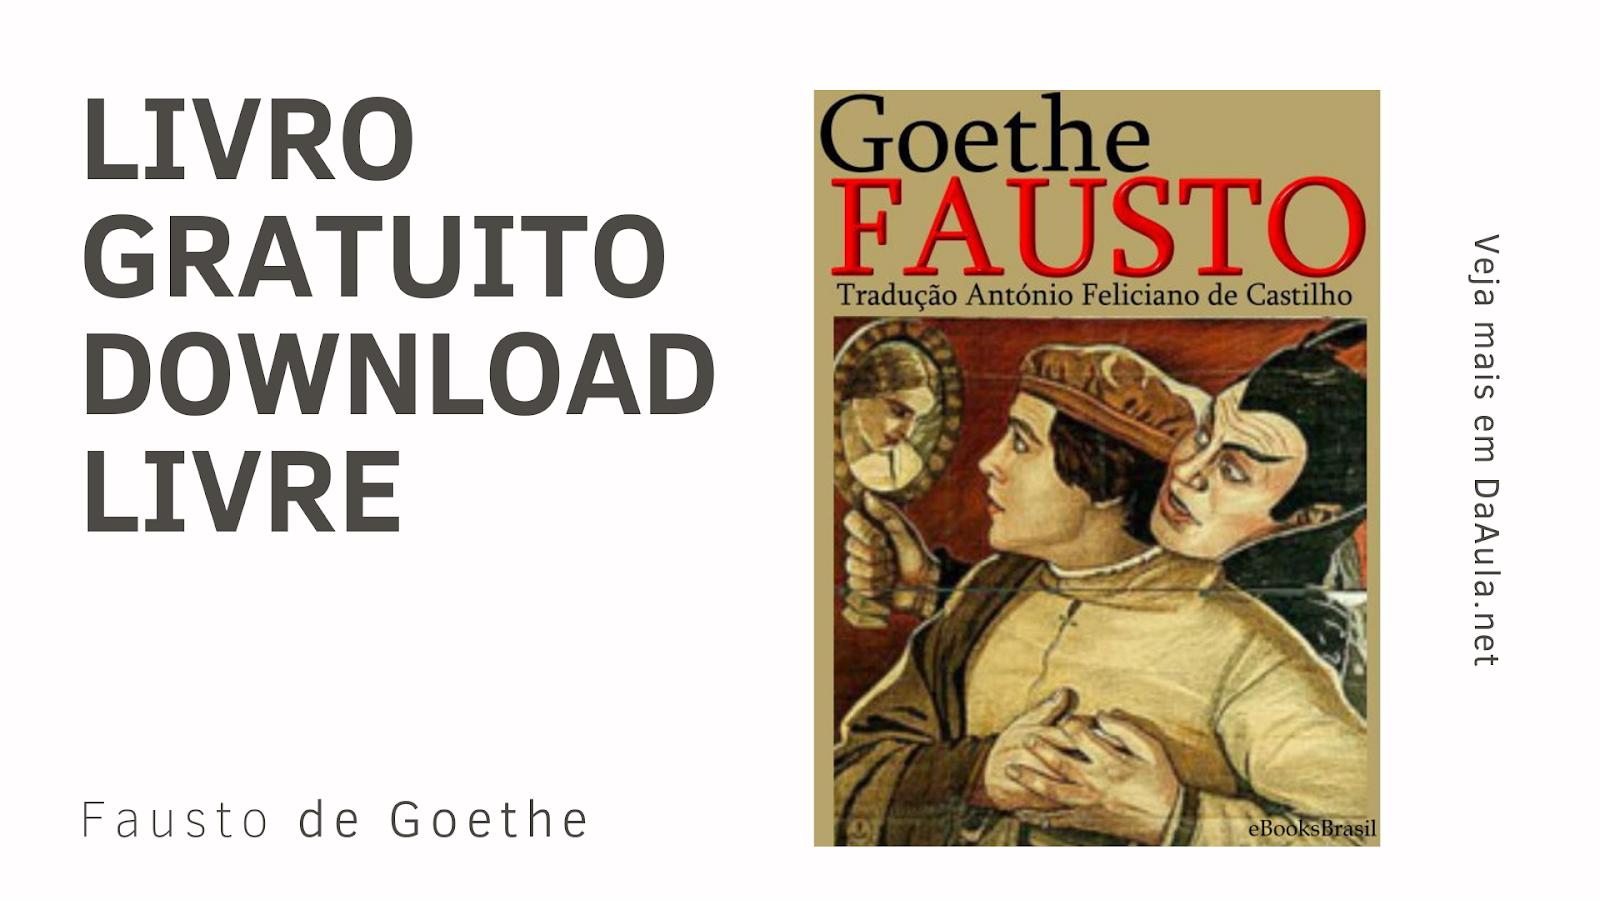 Livro: Fausto de Goethe